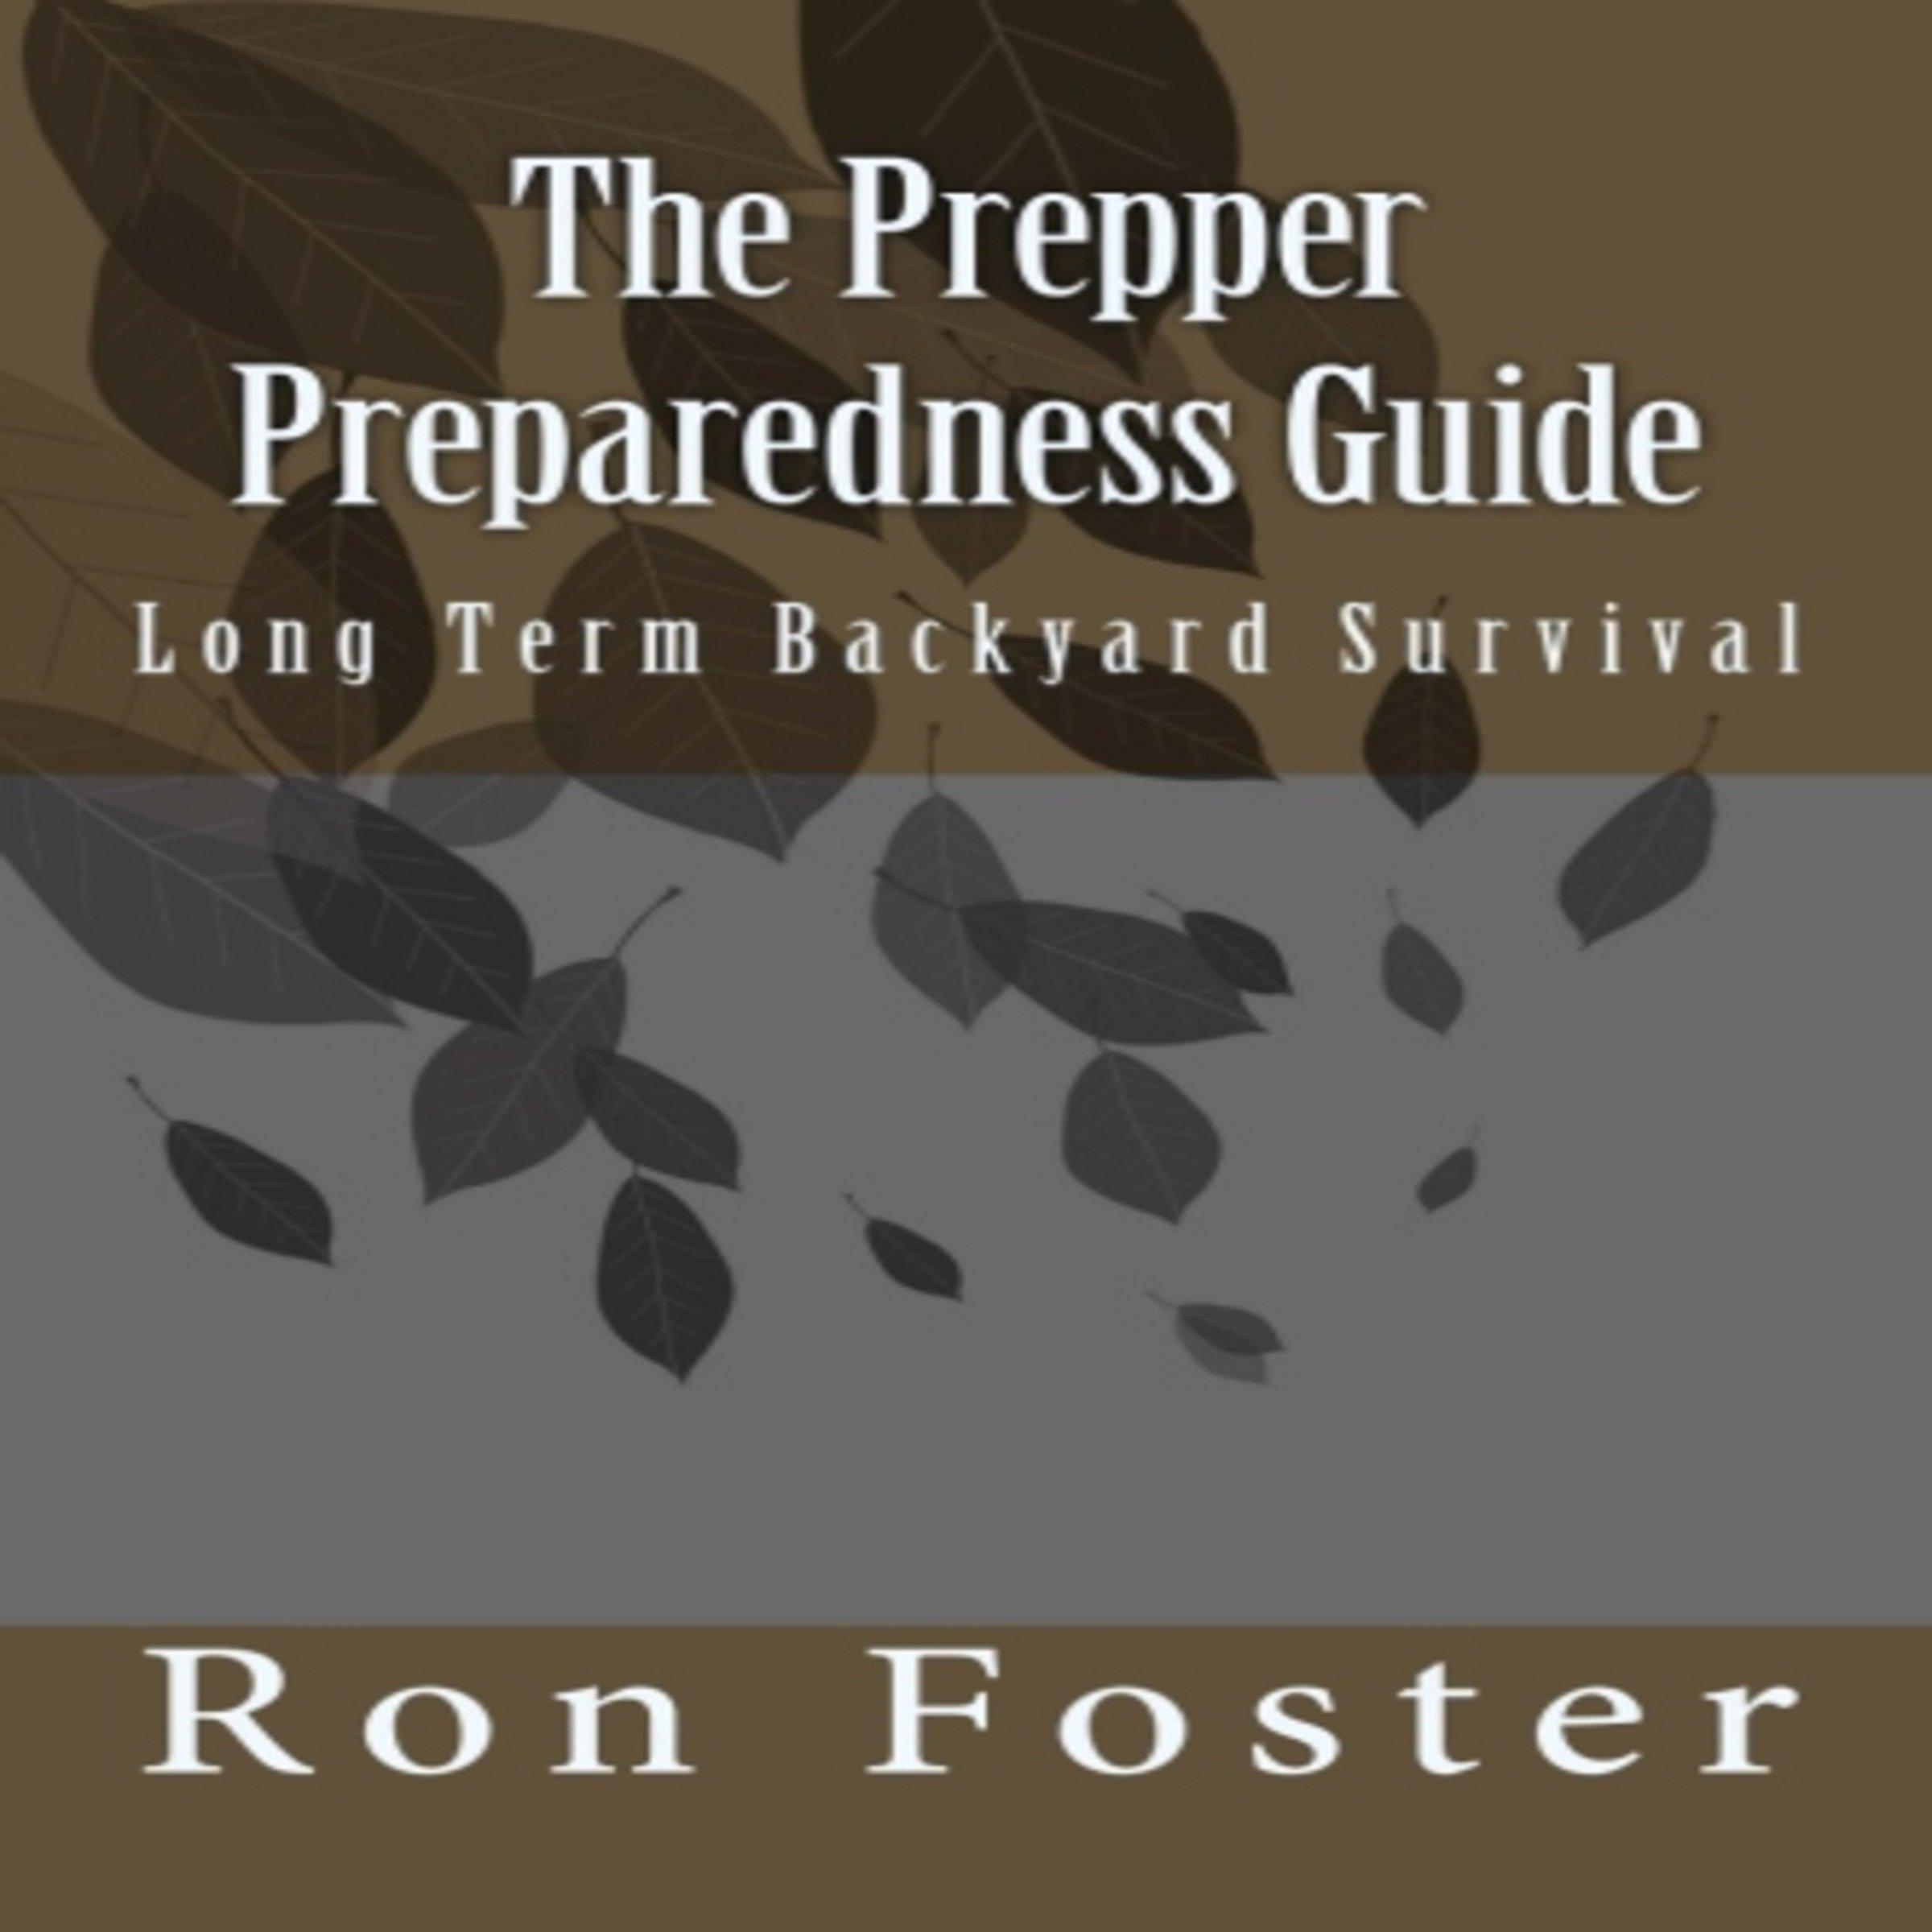 The Prepper Preparedness Guide: Long Term Backyard Survival